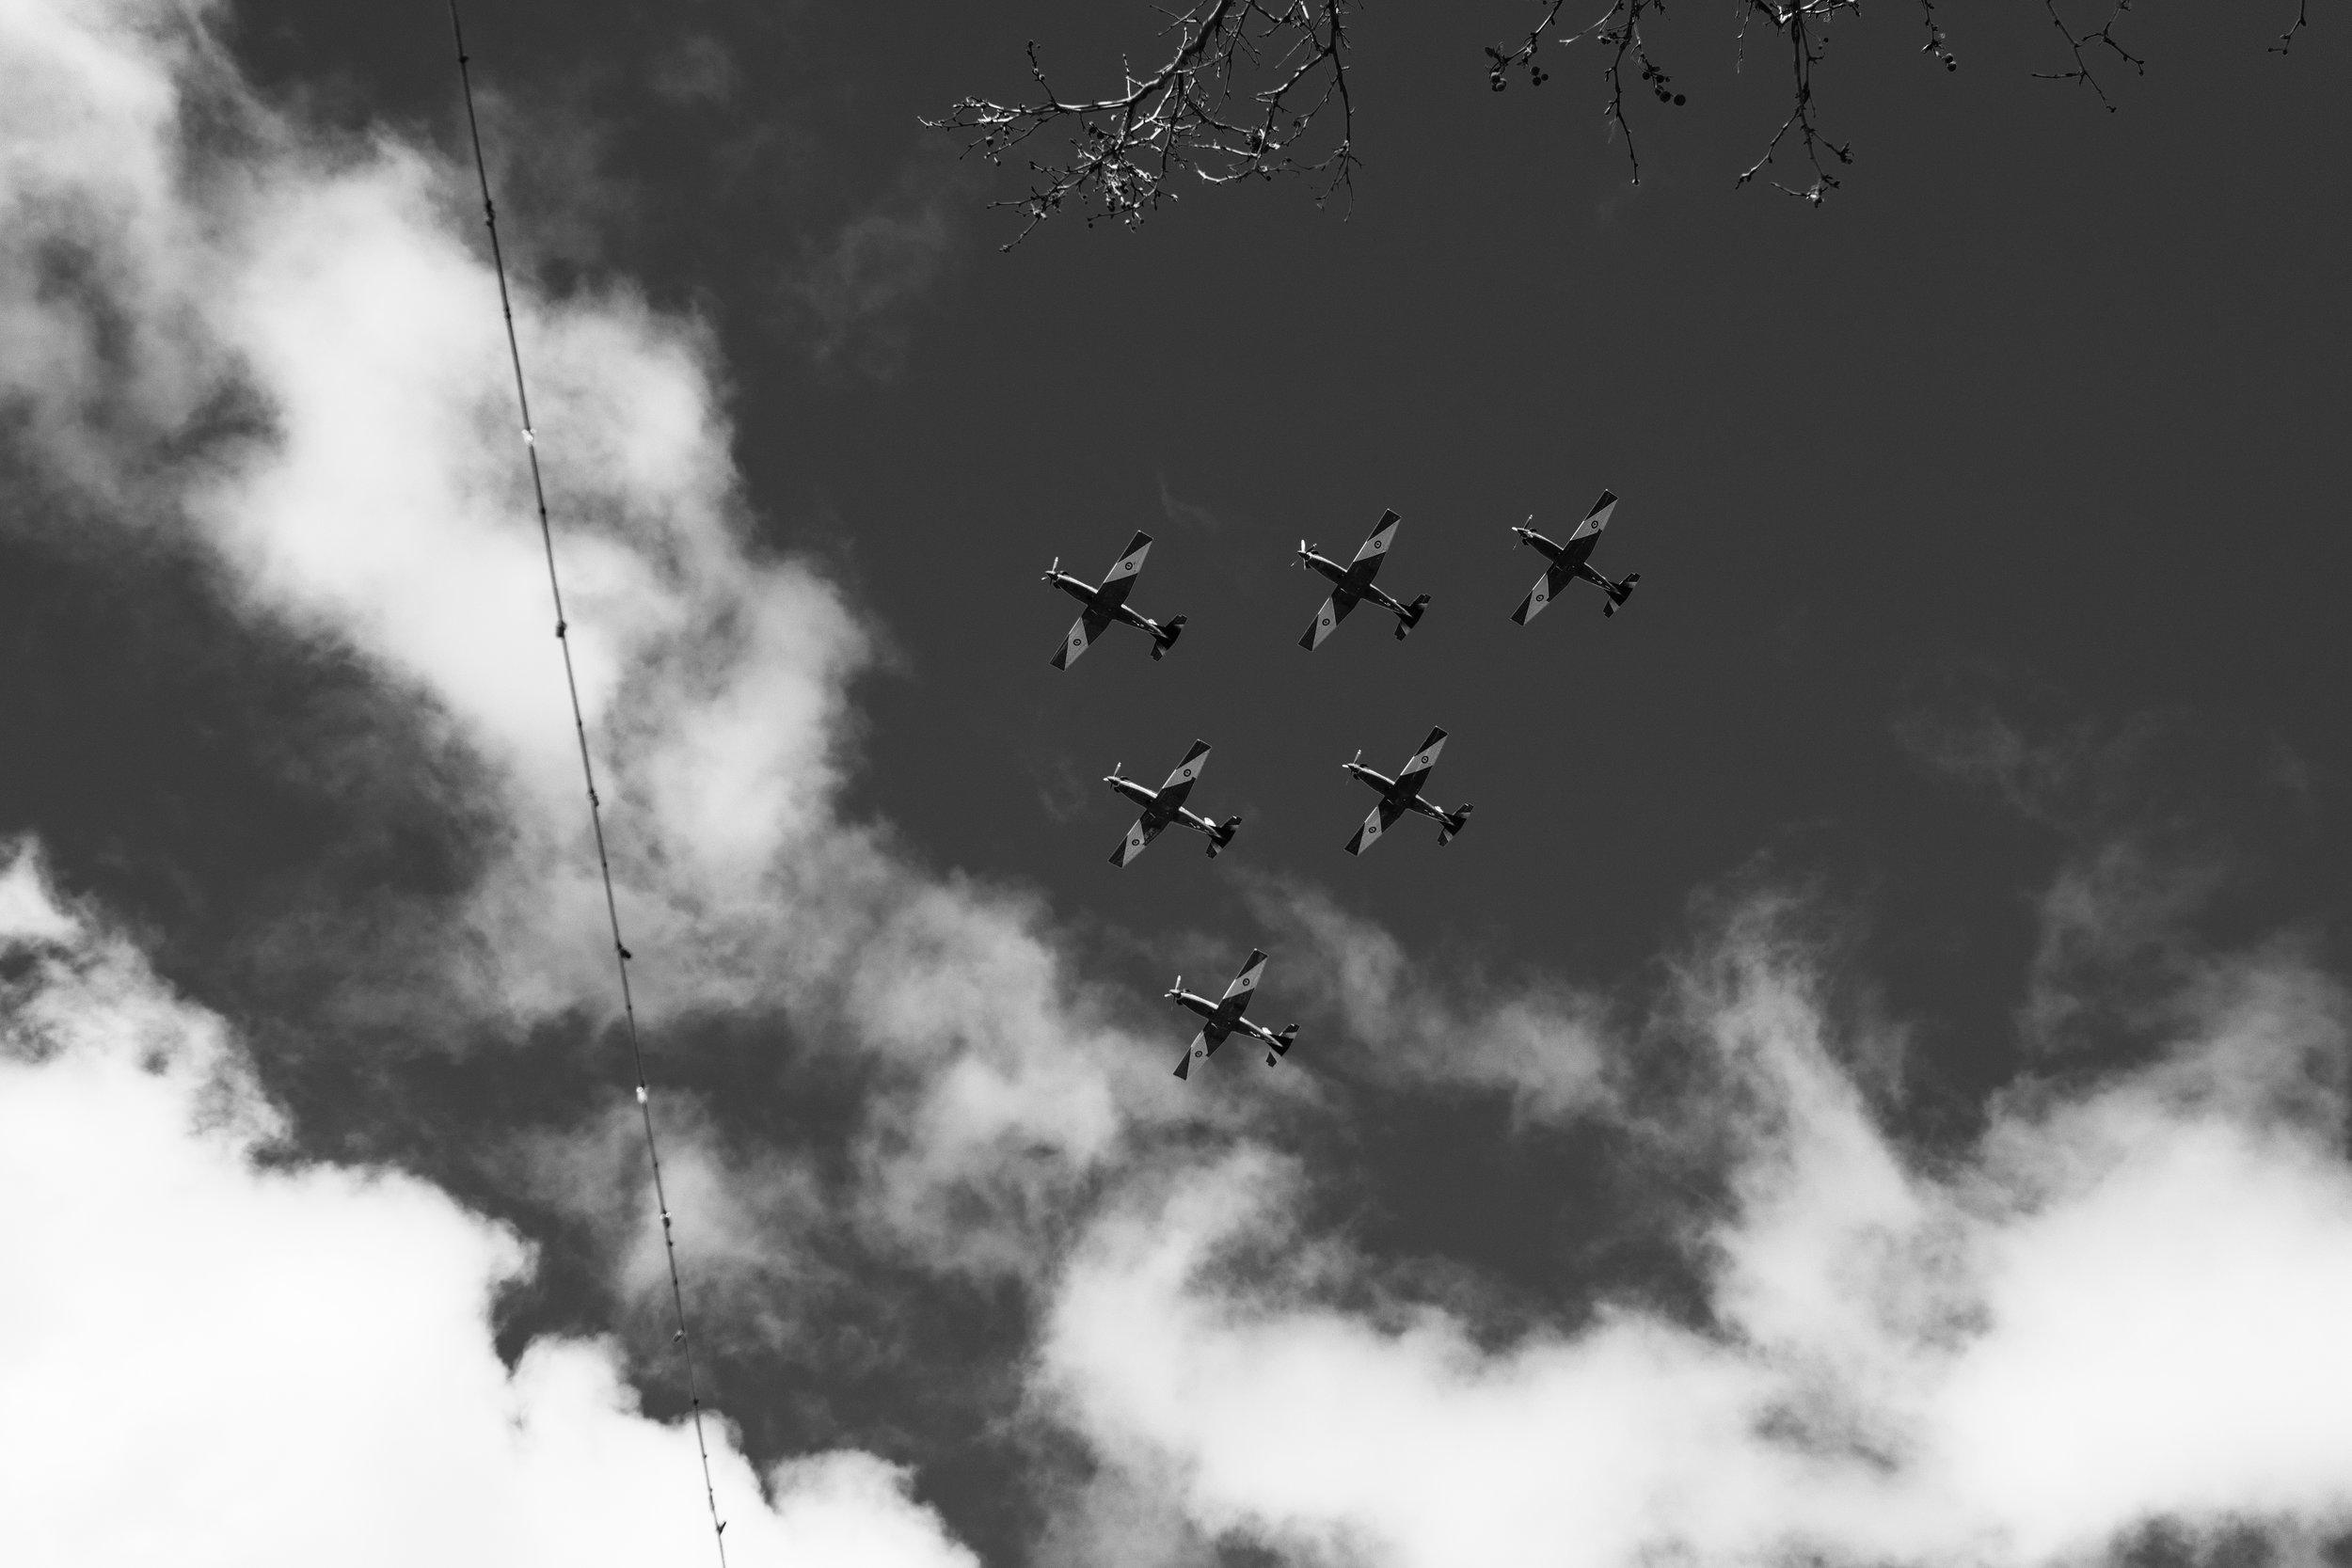 2013-09-13 - Hobart - Sandy Bay - Airforce Roulettes - untitled-7226-Edit.jpg